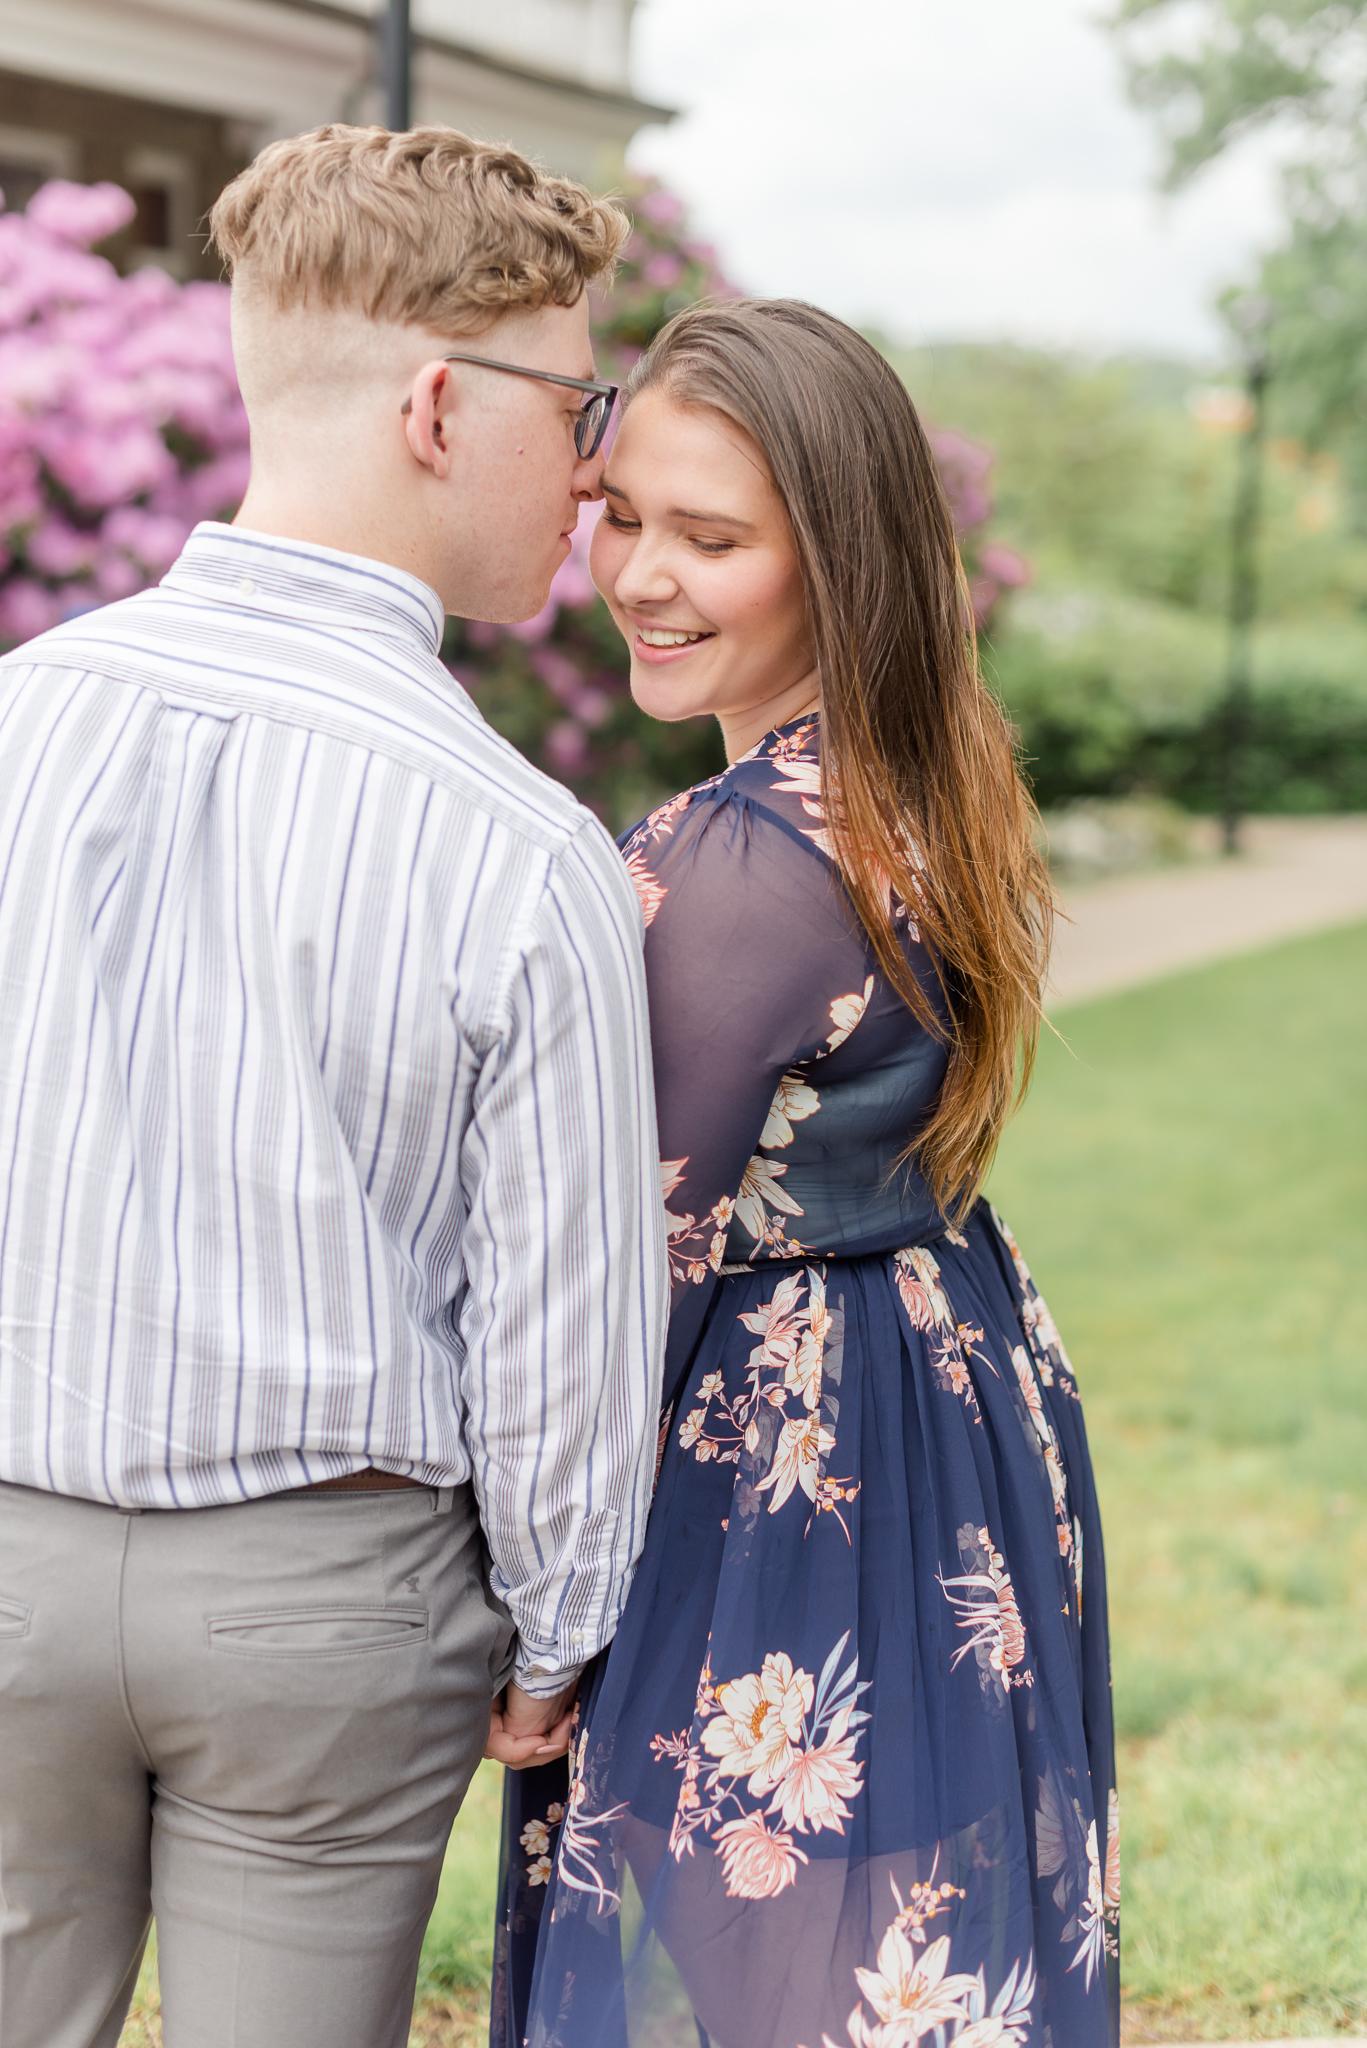 West Virginia University Surprise Proposal During Graduation Ceremony-28.jpg